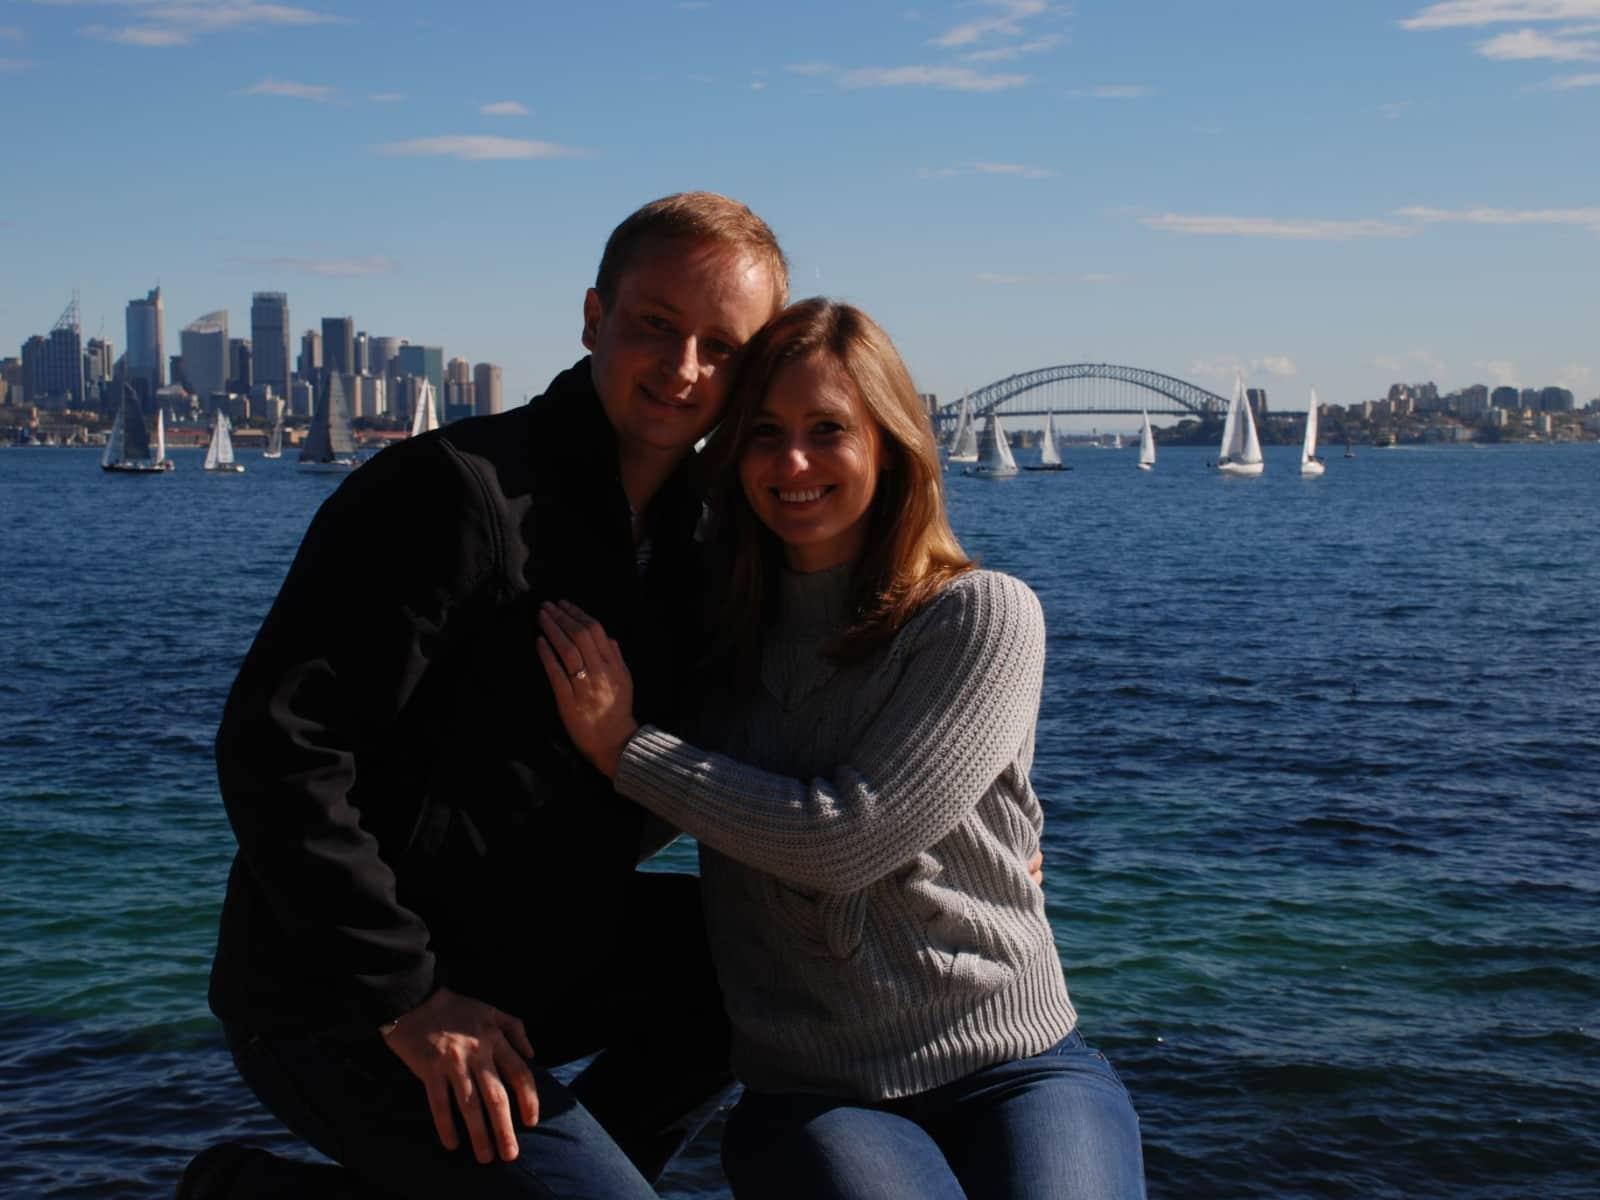 Mark from Sydney, New South Wales, Australia